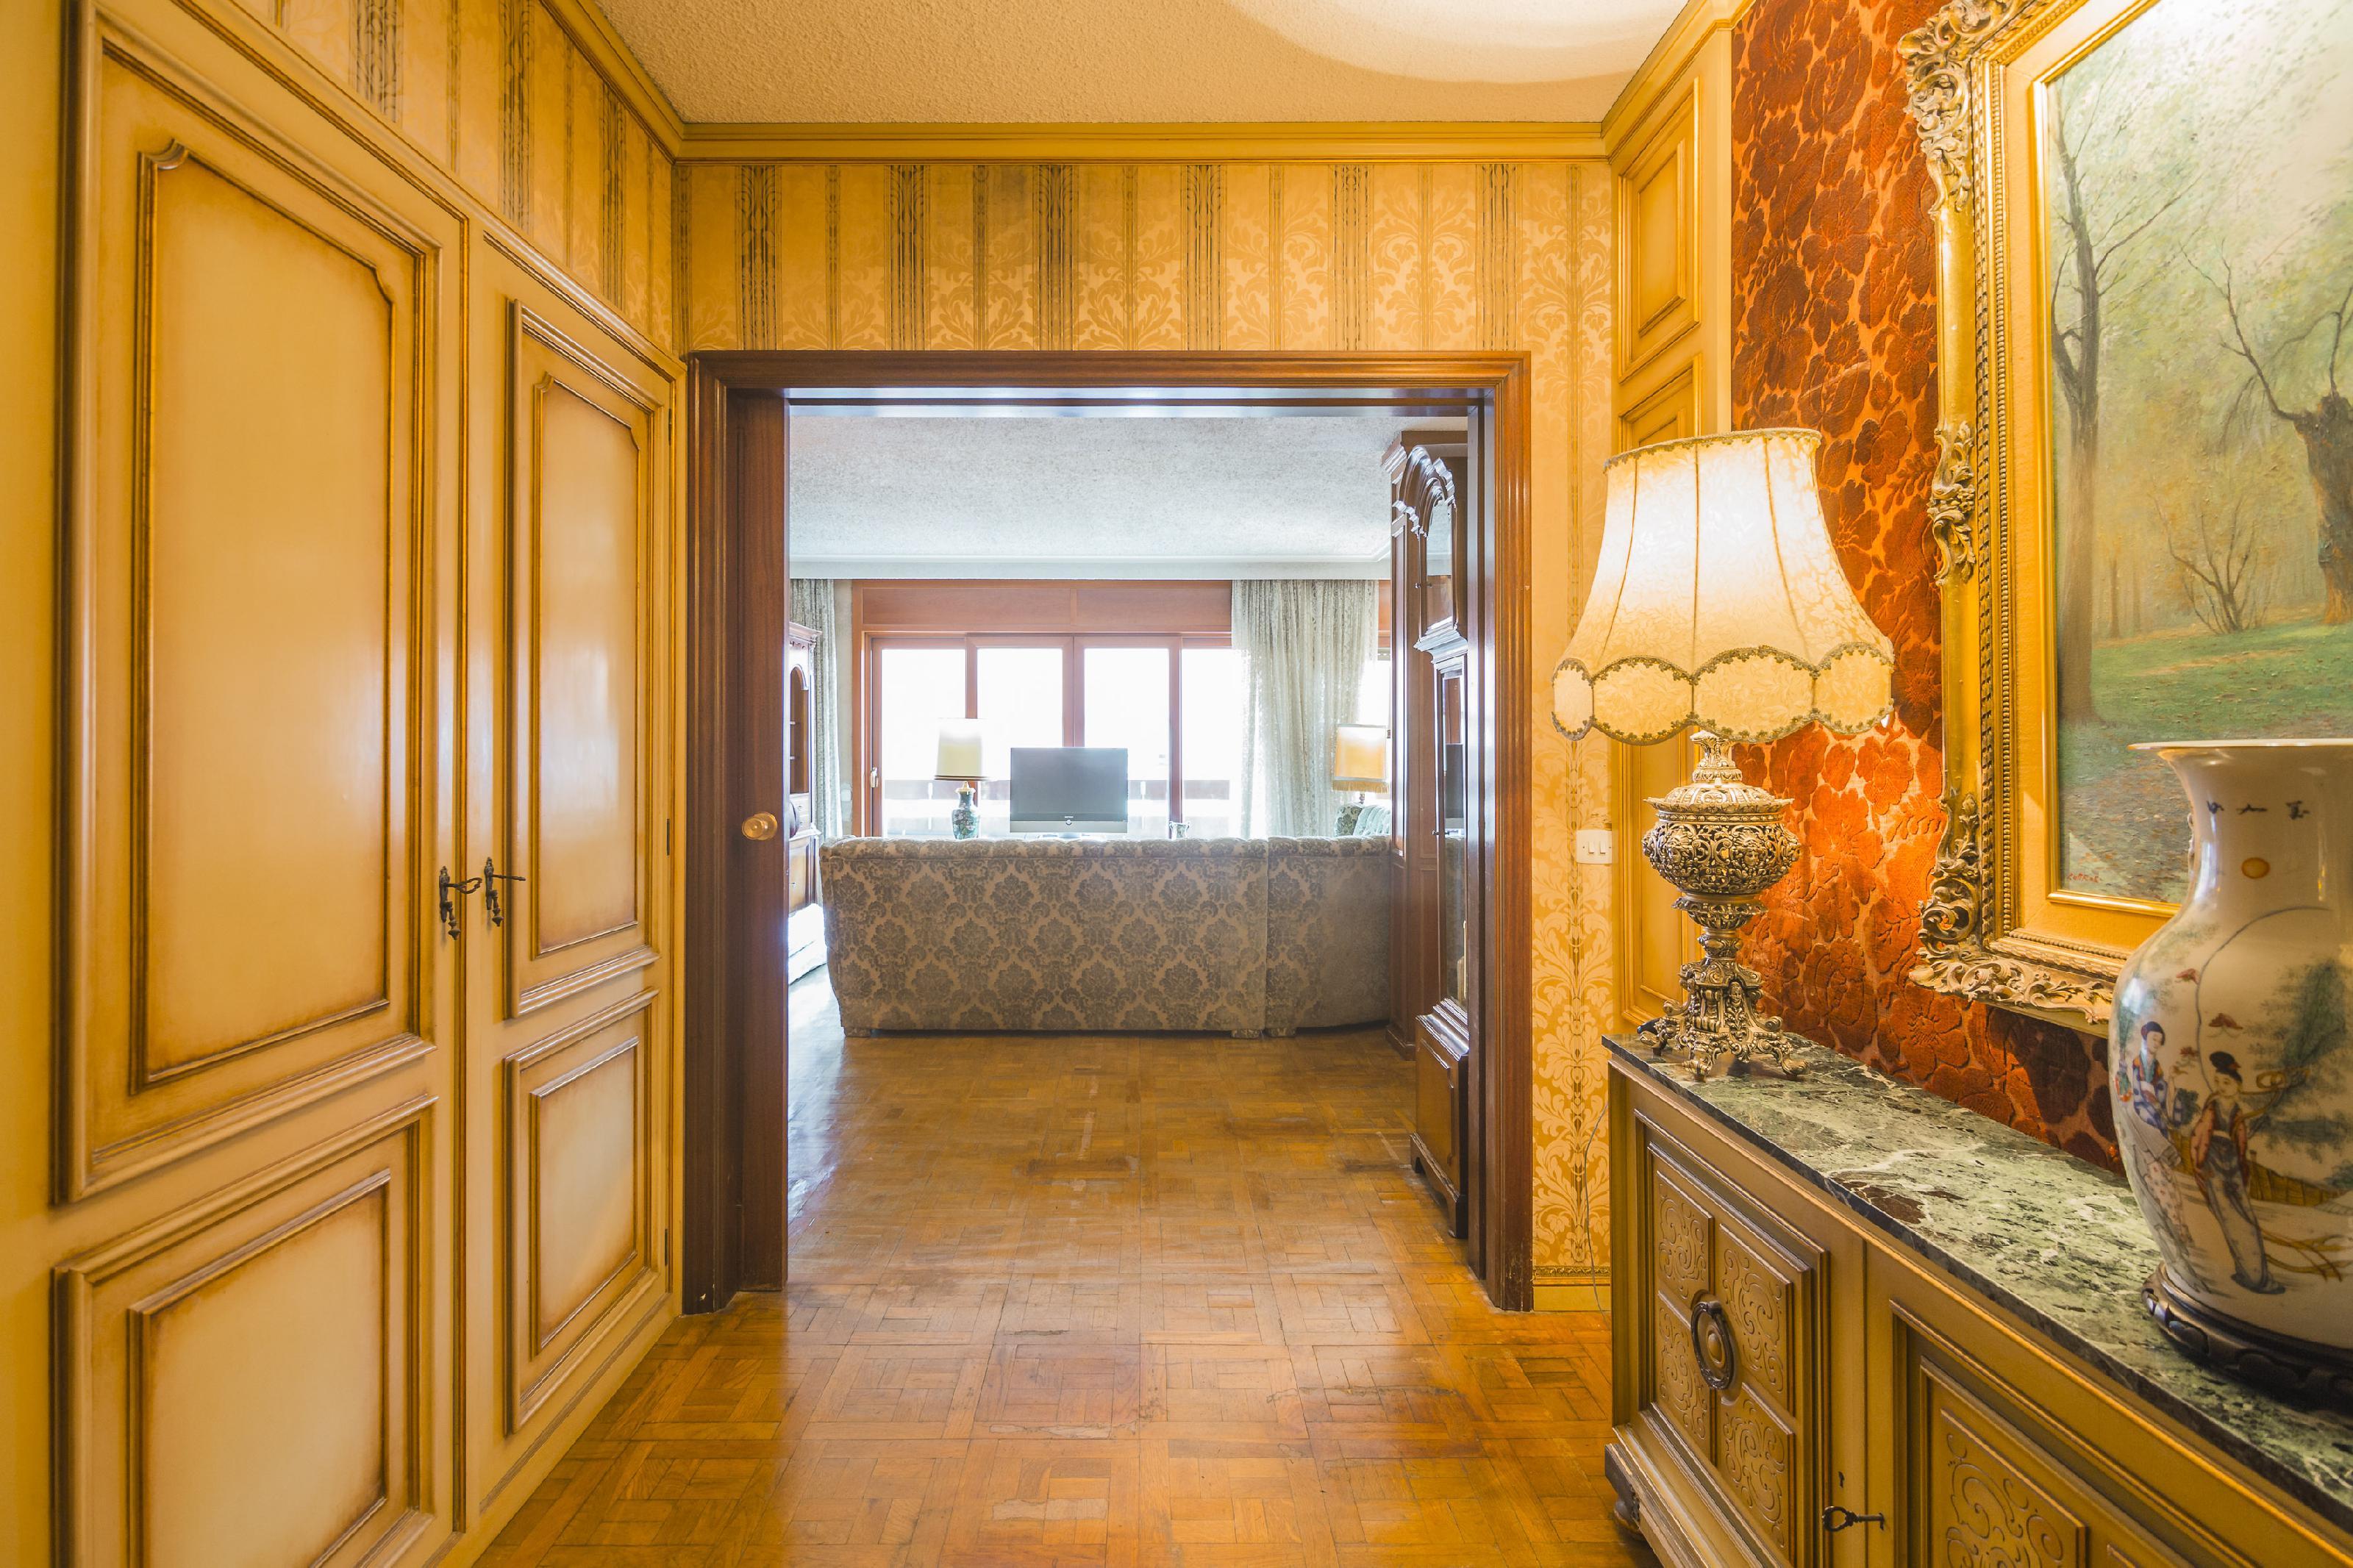 249856 Flat for sale in Sarrià-Sant Gervasi, Sant Gervasi-Galvany 20